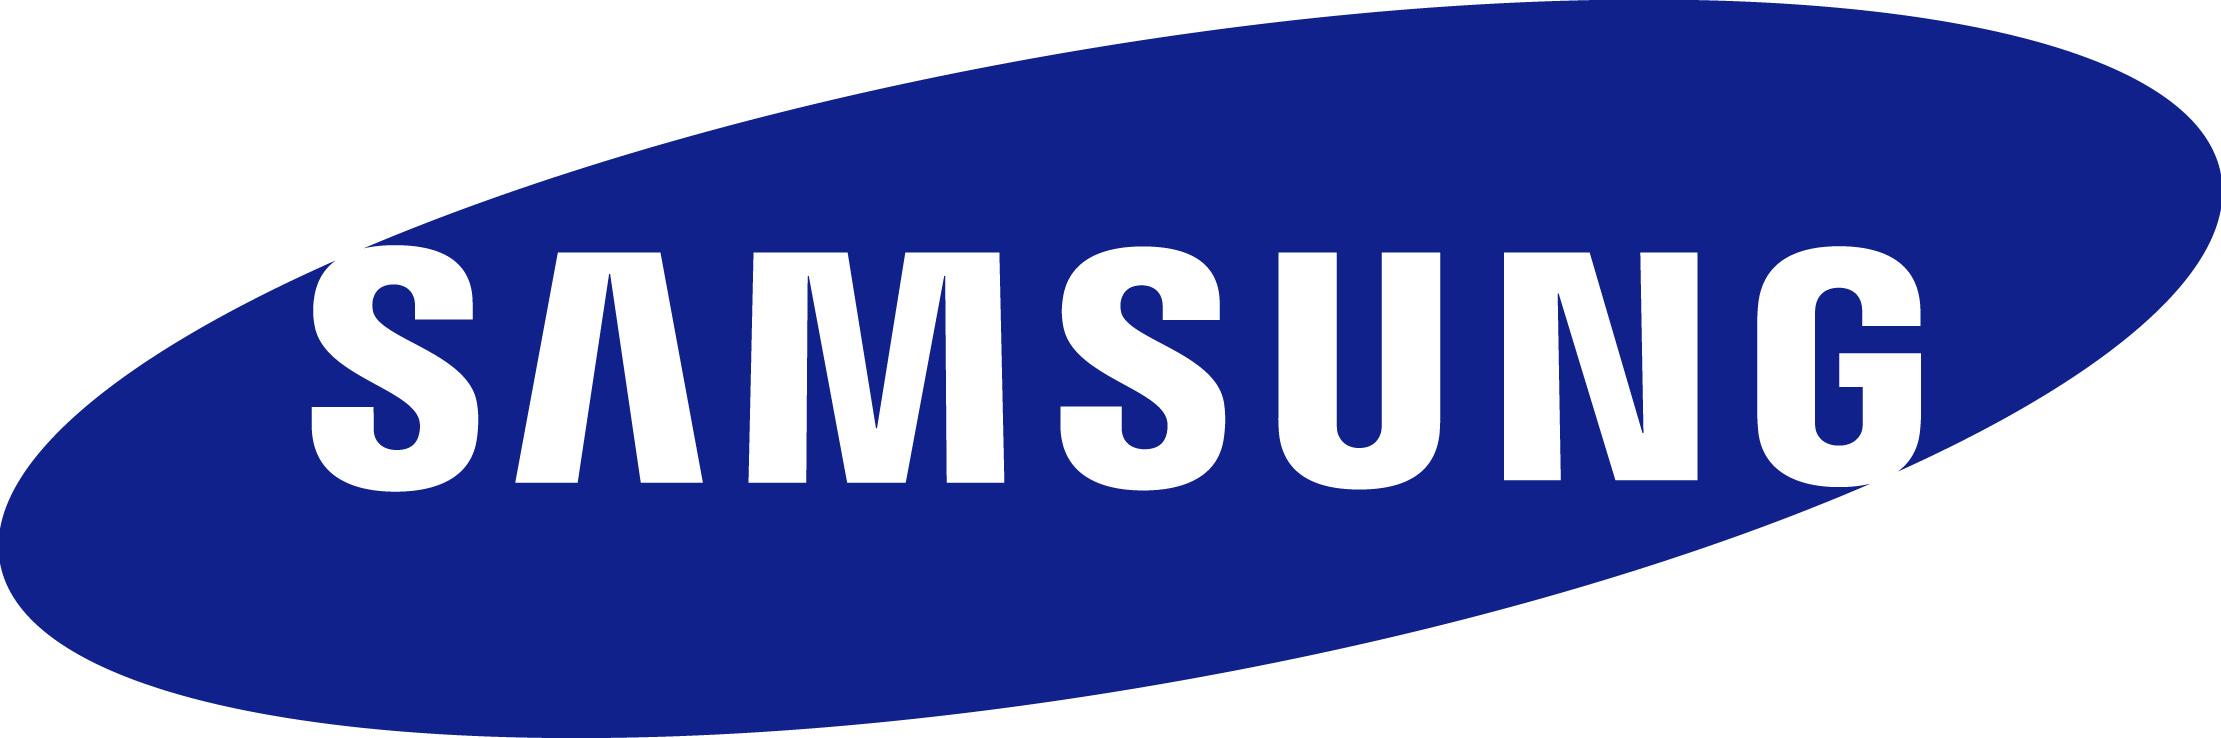 Samsung HW F355 Barre de son 2.1 Caisson de basses filaire 120 W